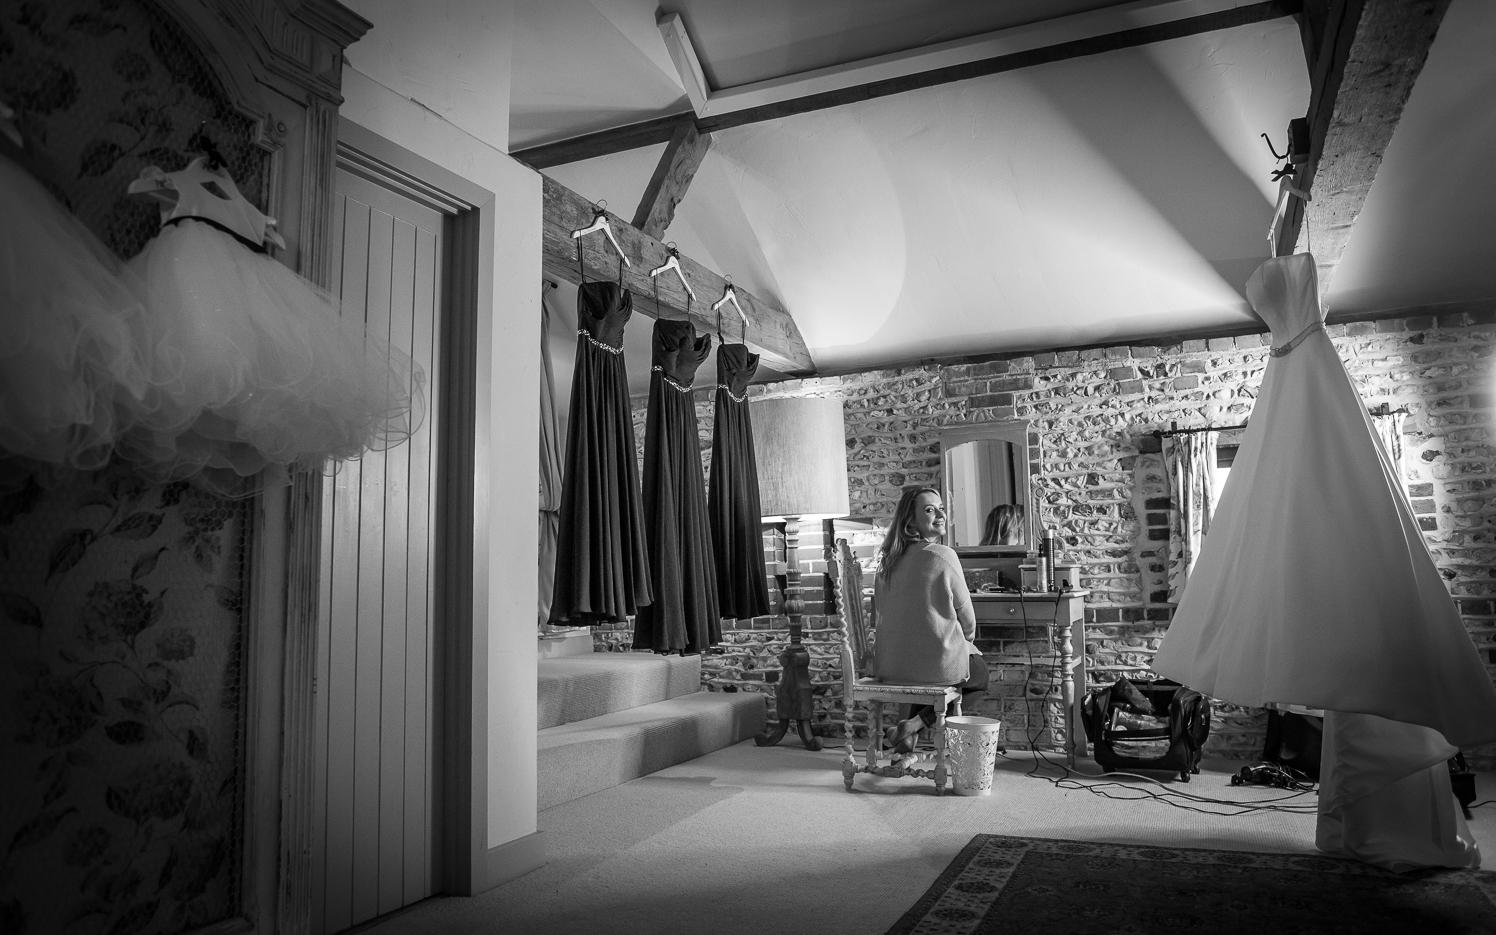 upwaltham barns winter wedding Lauren David dec 17-33.jpg